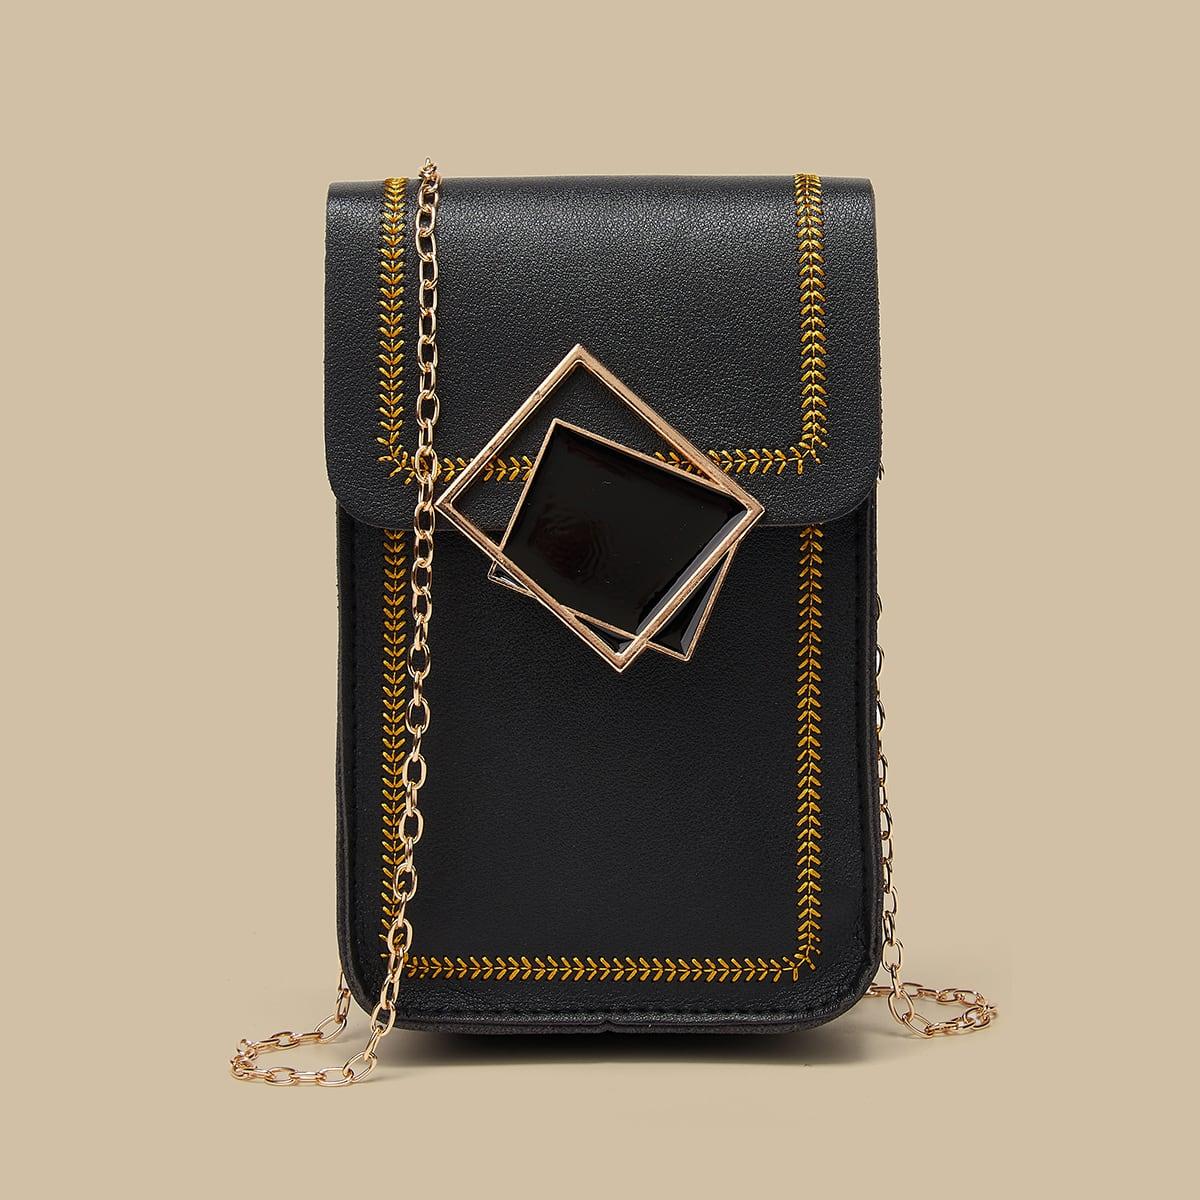 Geometric Decor Stitch Trim Flap Chain Bag